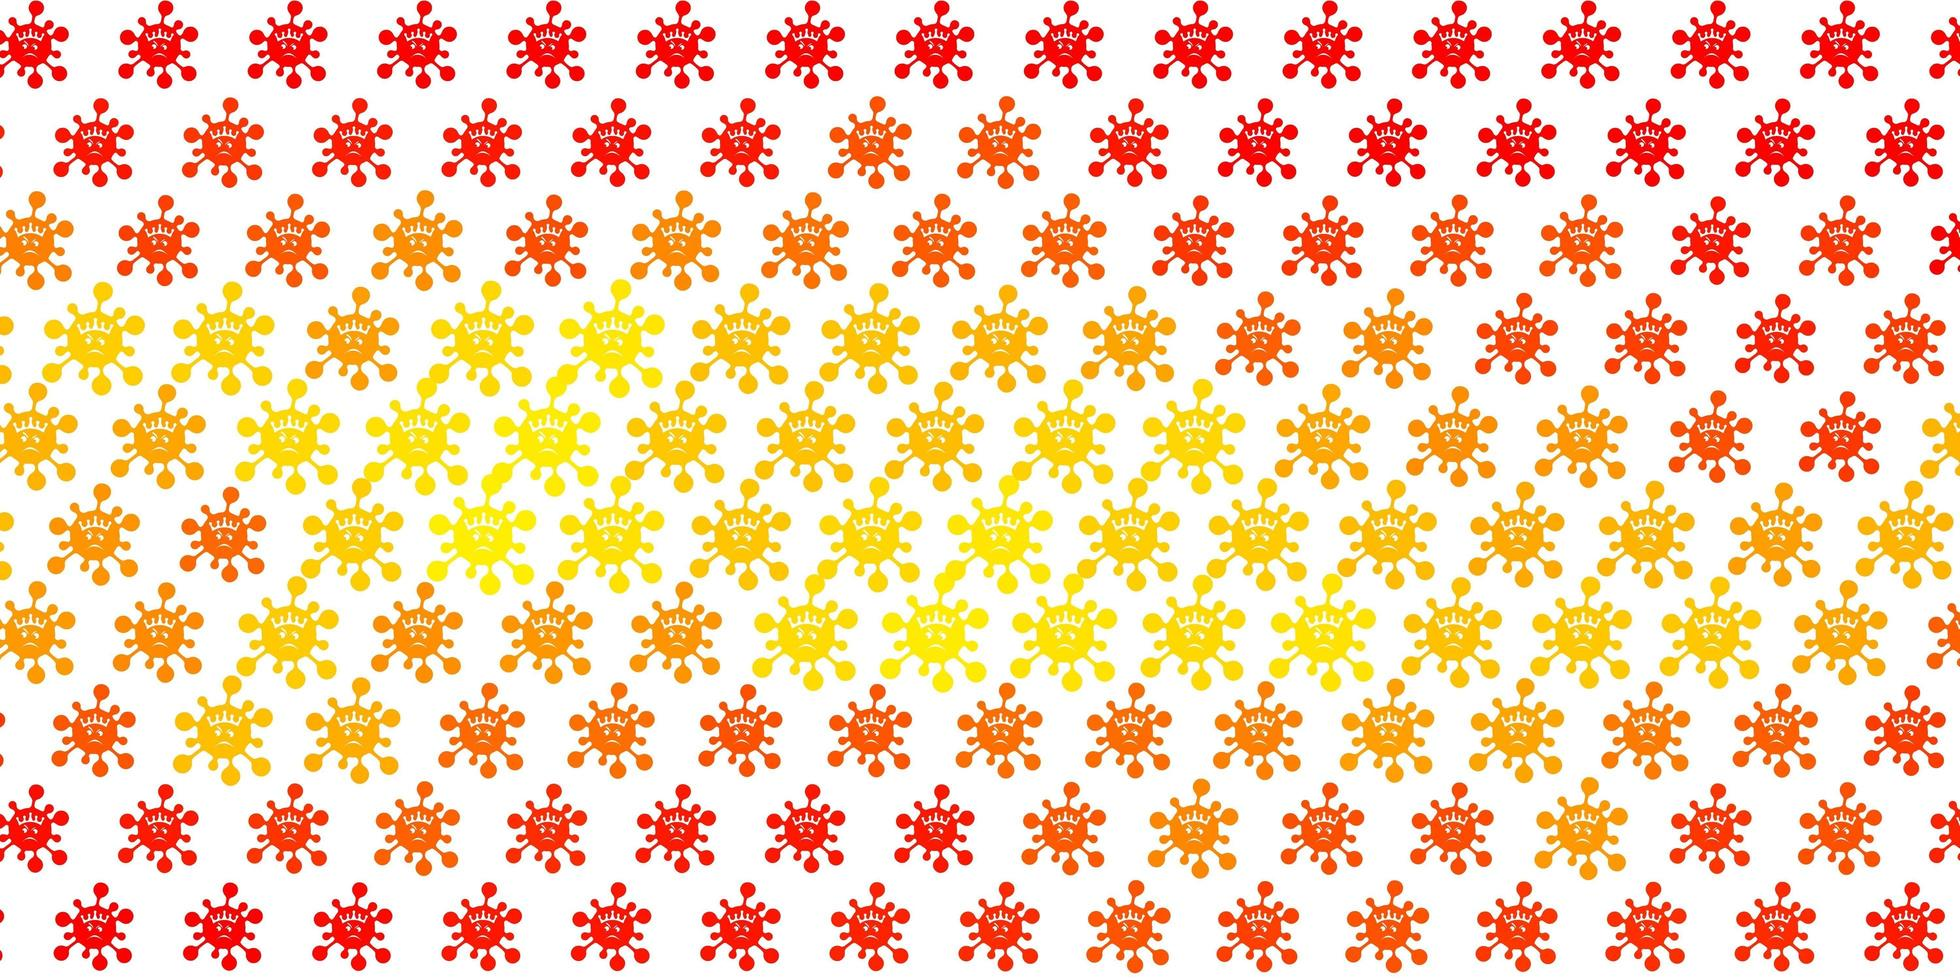 fundo laranja claro com símbolos covid-19 vetor